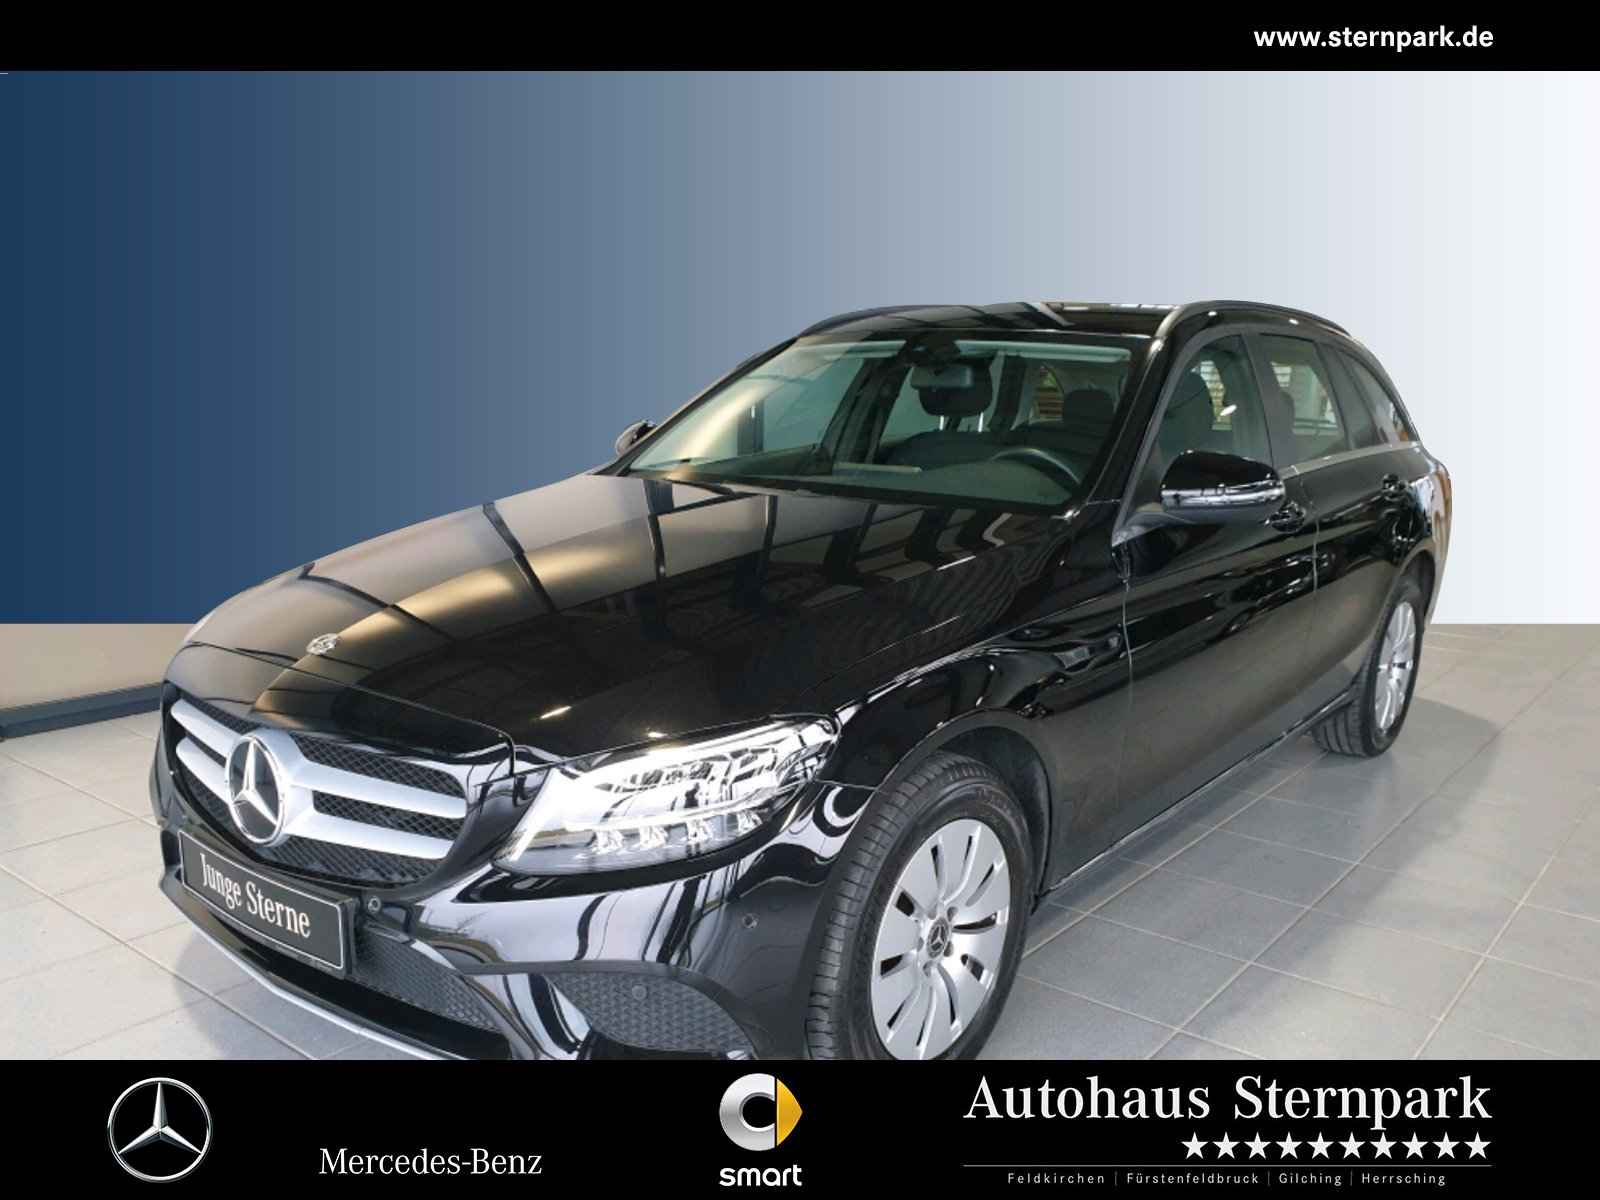 Mercedes-Benz C 200 d T Navi+AHK+LED+Kamera+Apple+Multi-Media, Jahr 2019, Diesel